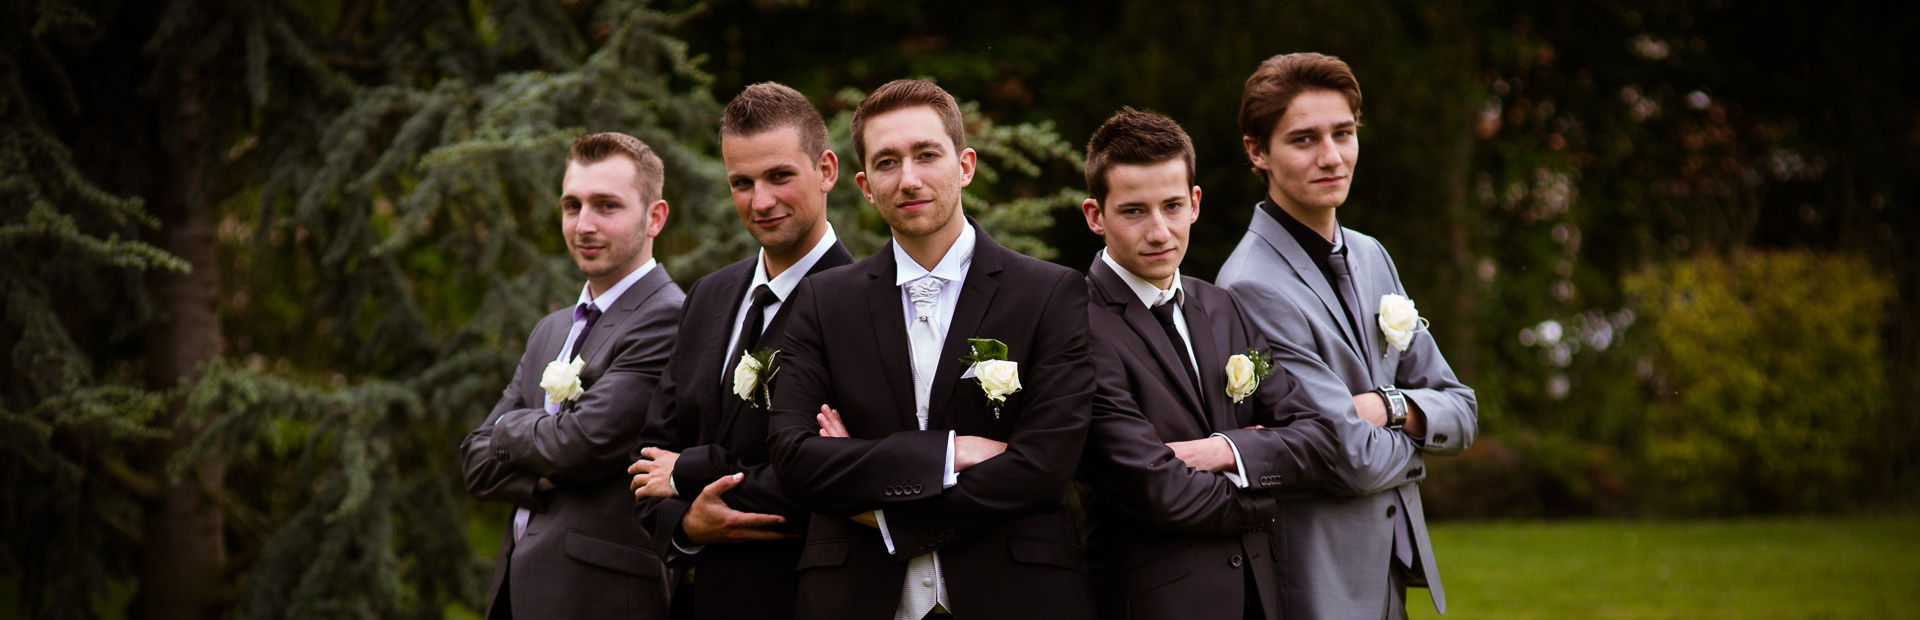 Photographe mariage nord pas de calais lille arras hauts de france - Photo de groupe mariage ...